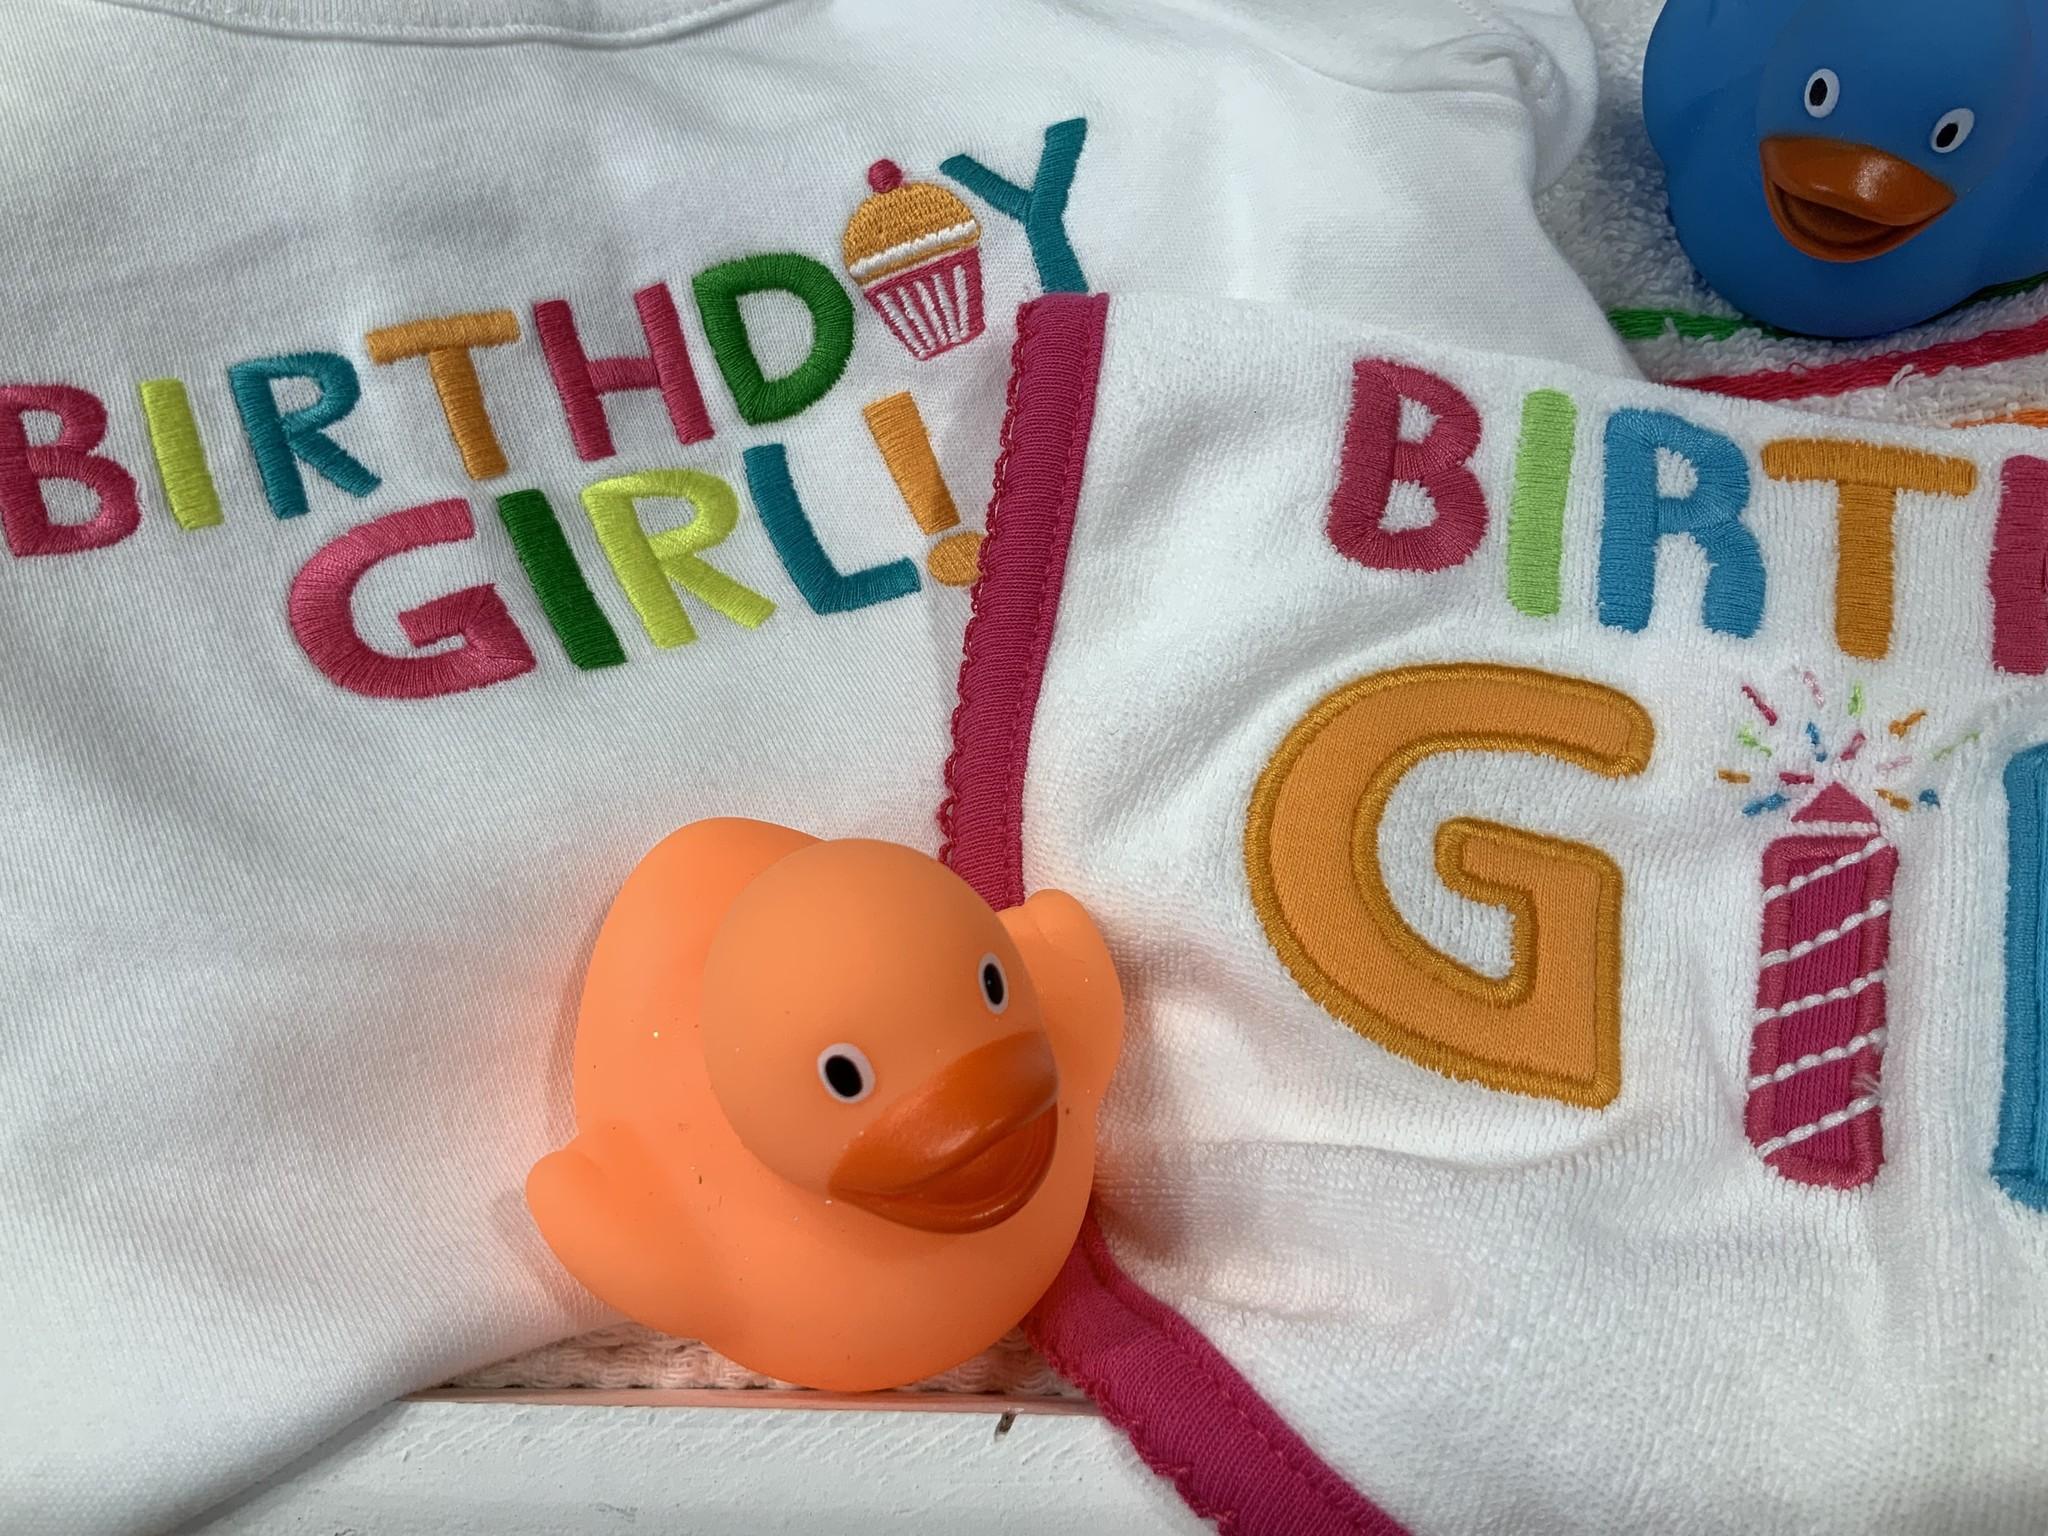 Verjaardagscadeau BIRTHDAY GIRL